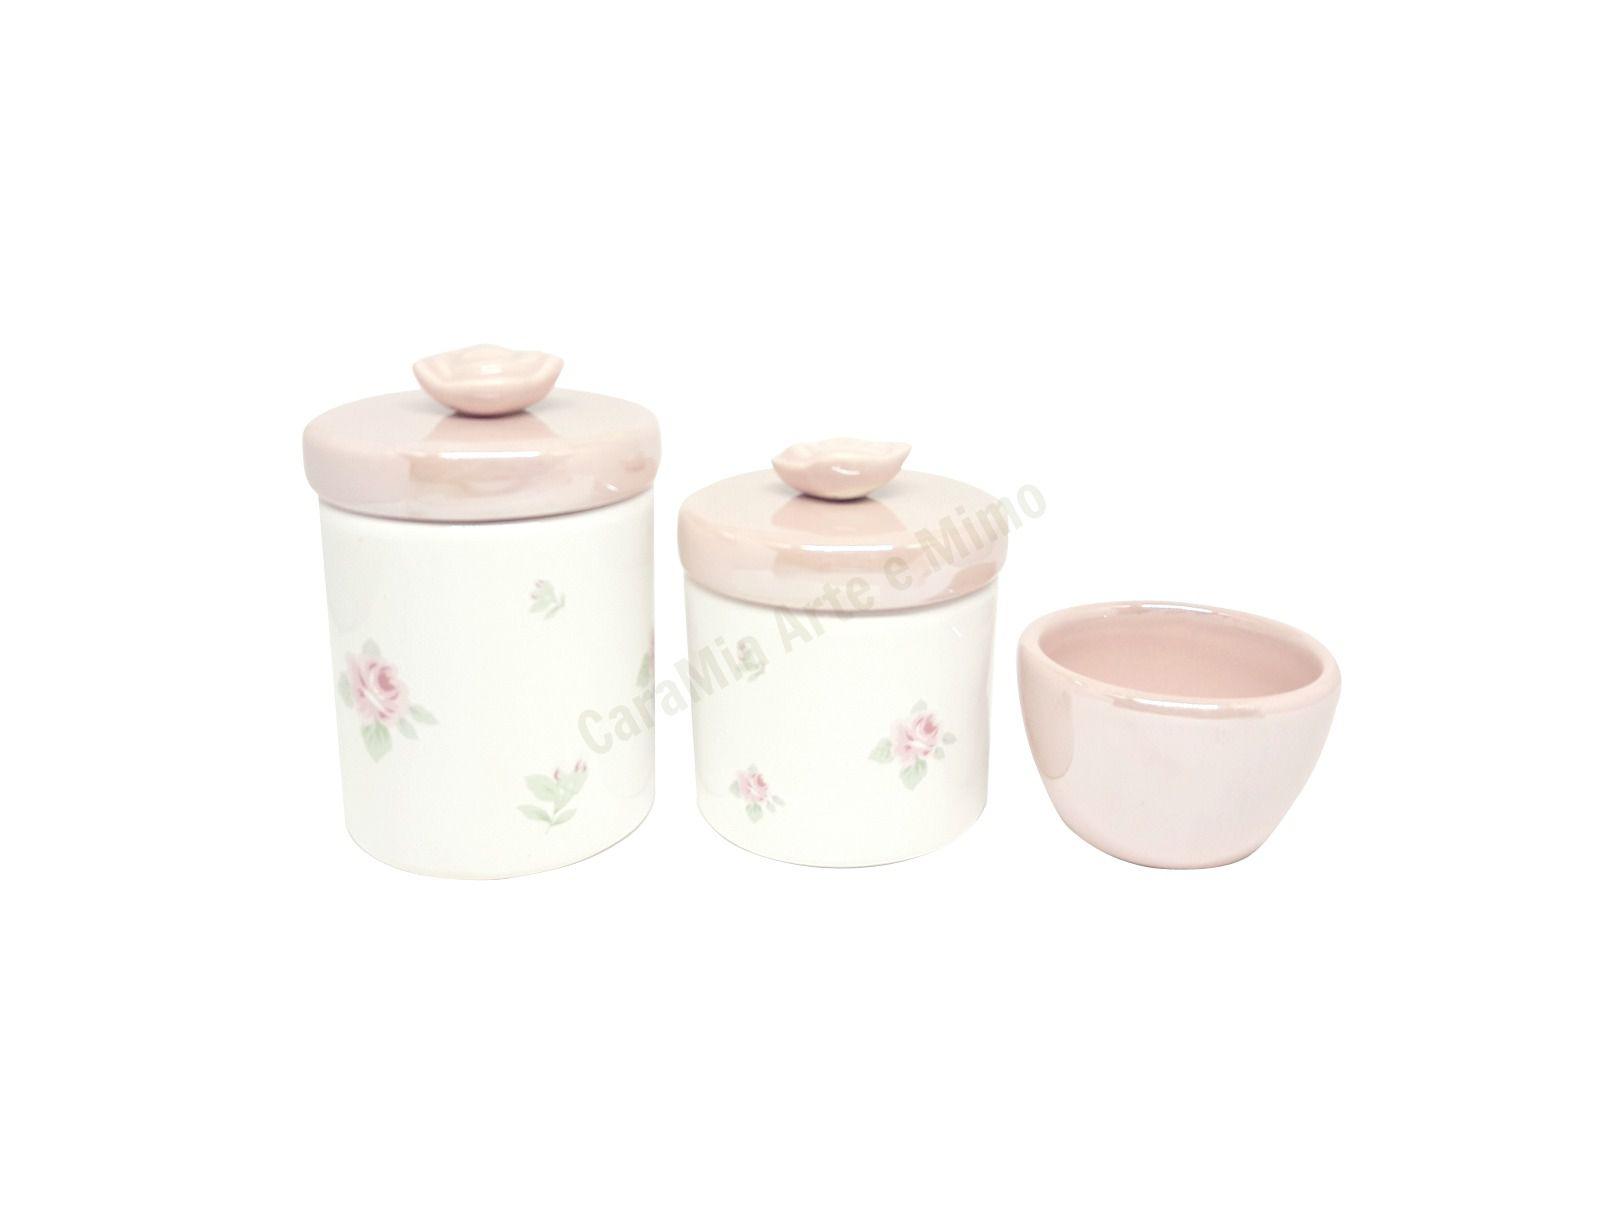 Kit Higiene Bebê Cerâmica Floral Rosa | Perolizado| 3 peças